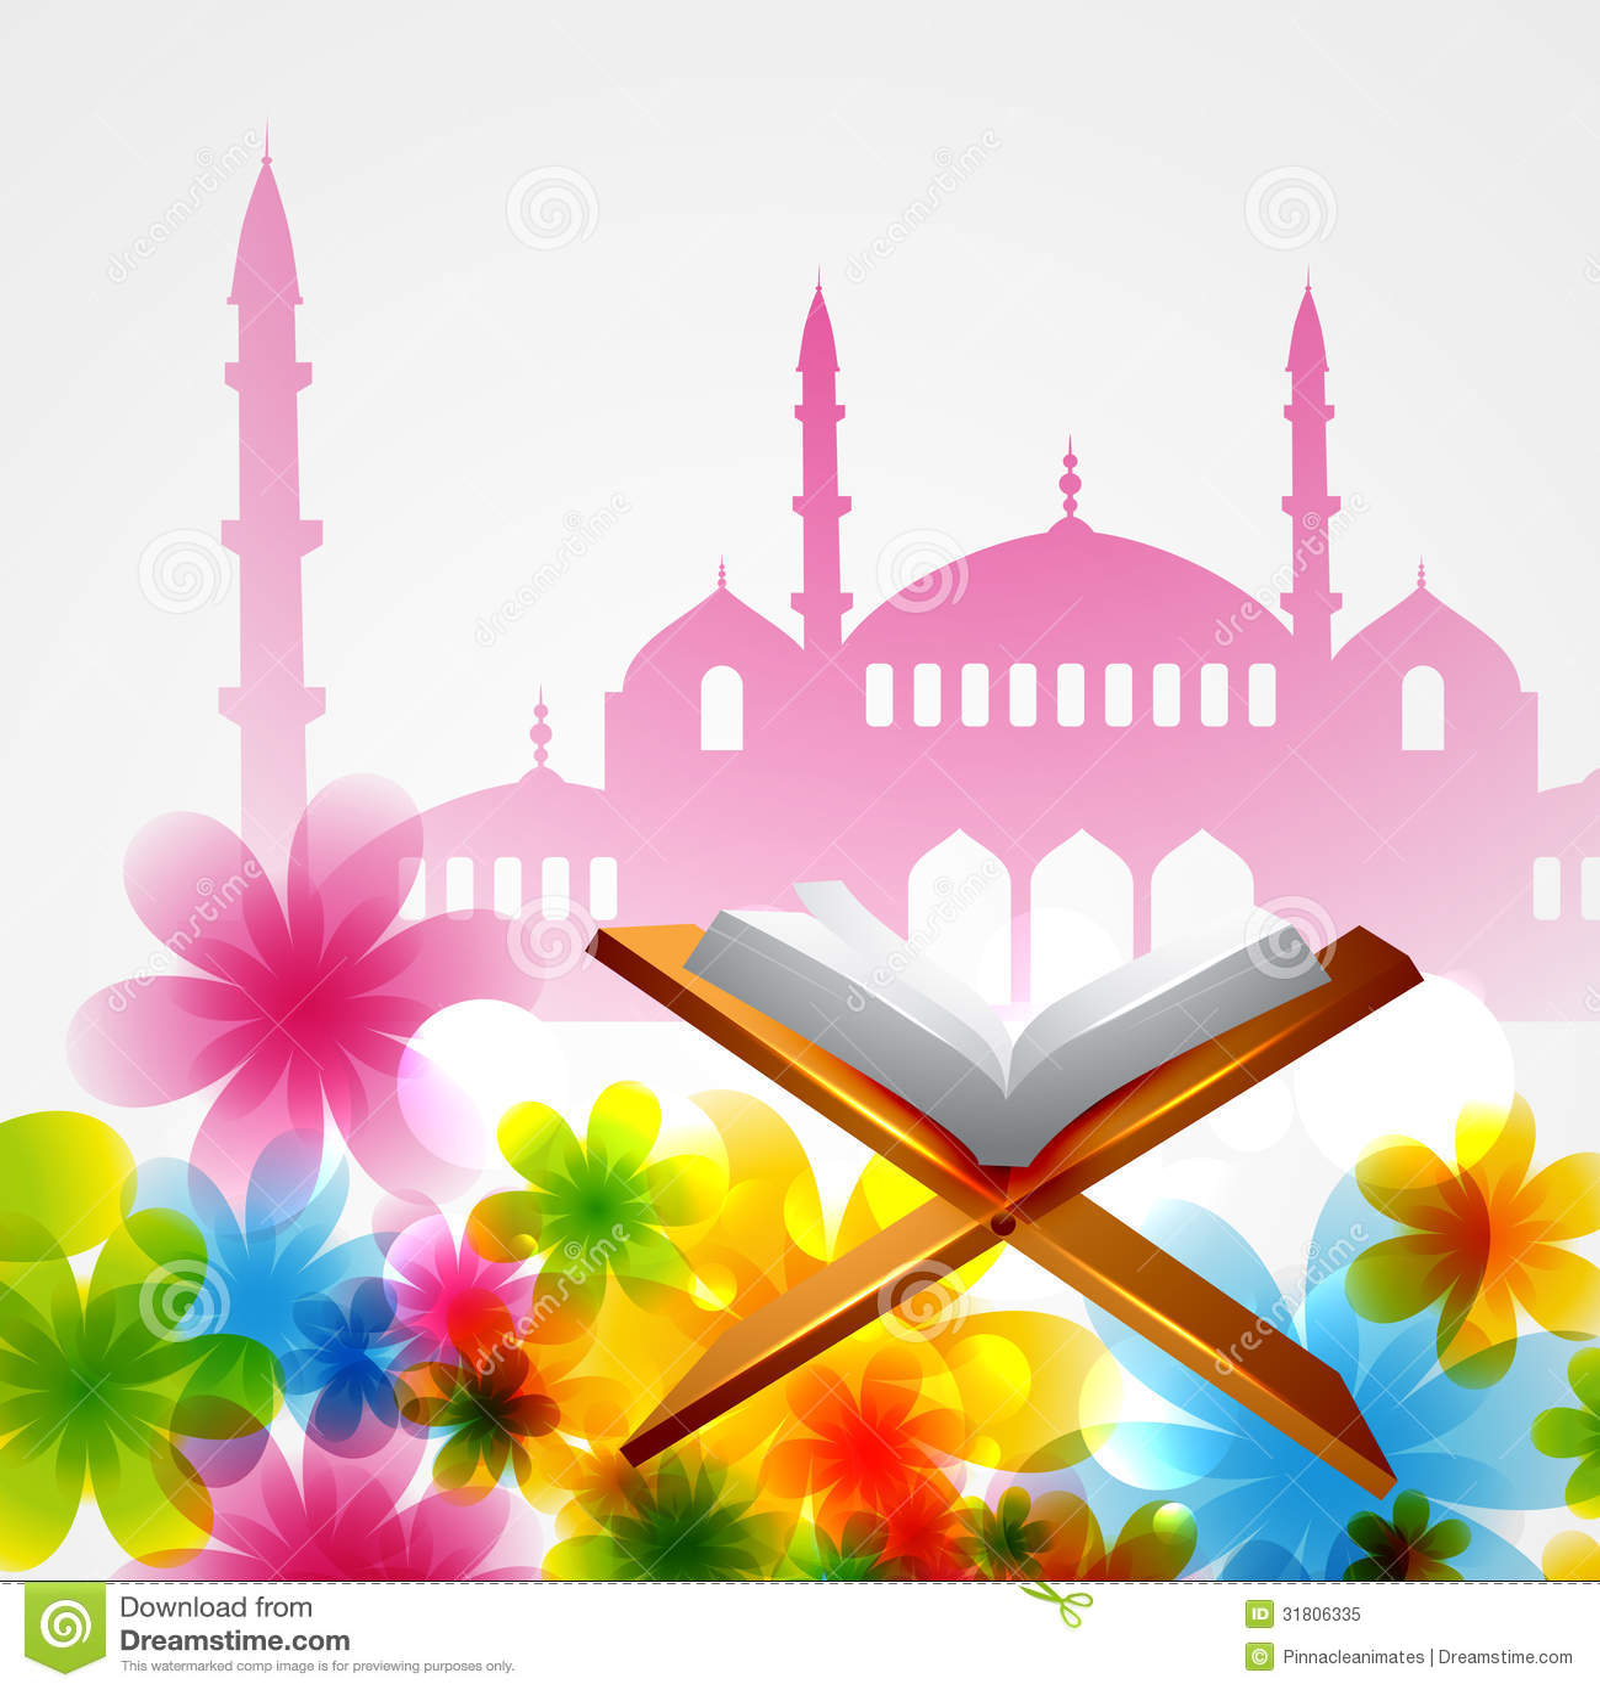 Eid Mubarak Wallpaper 3d Vector Book Of Quran Royalty Free Stock Photo Image